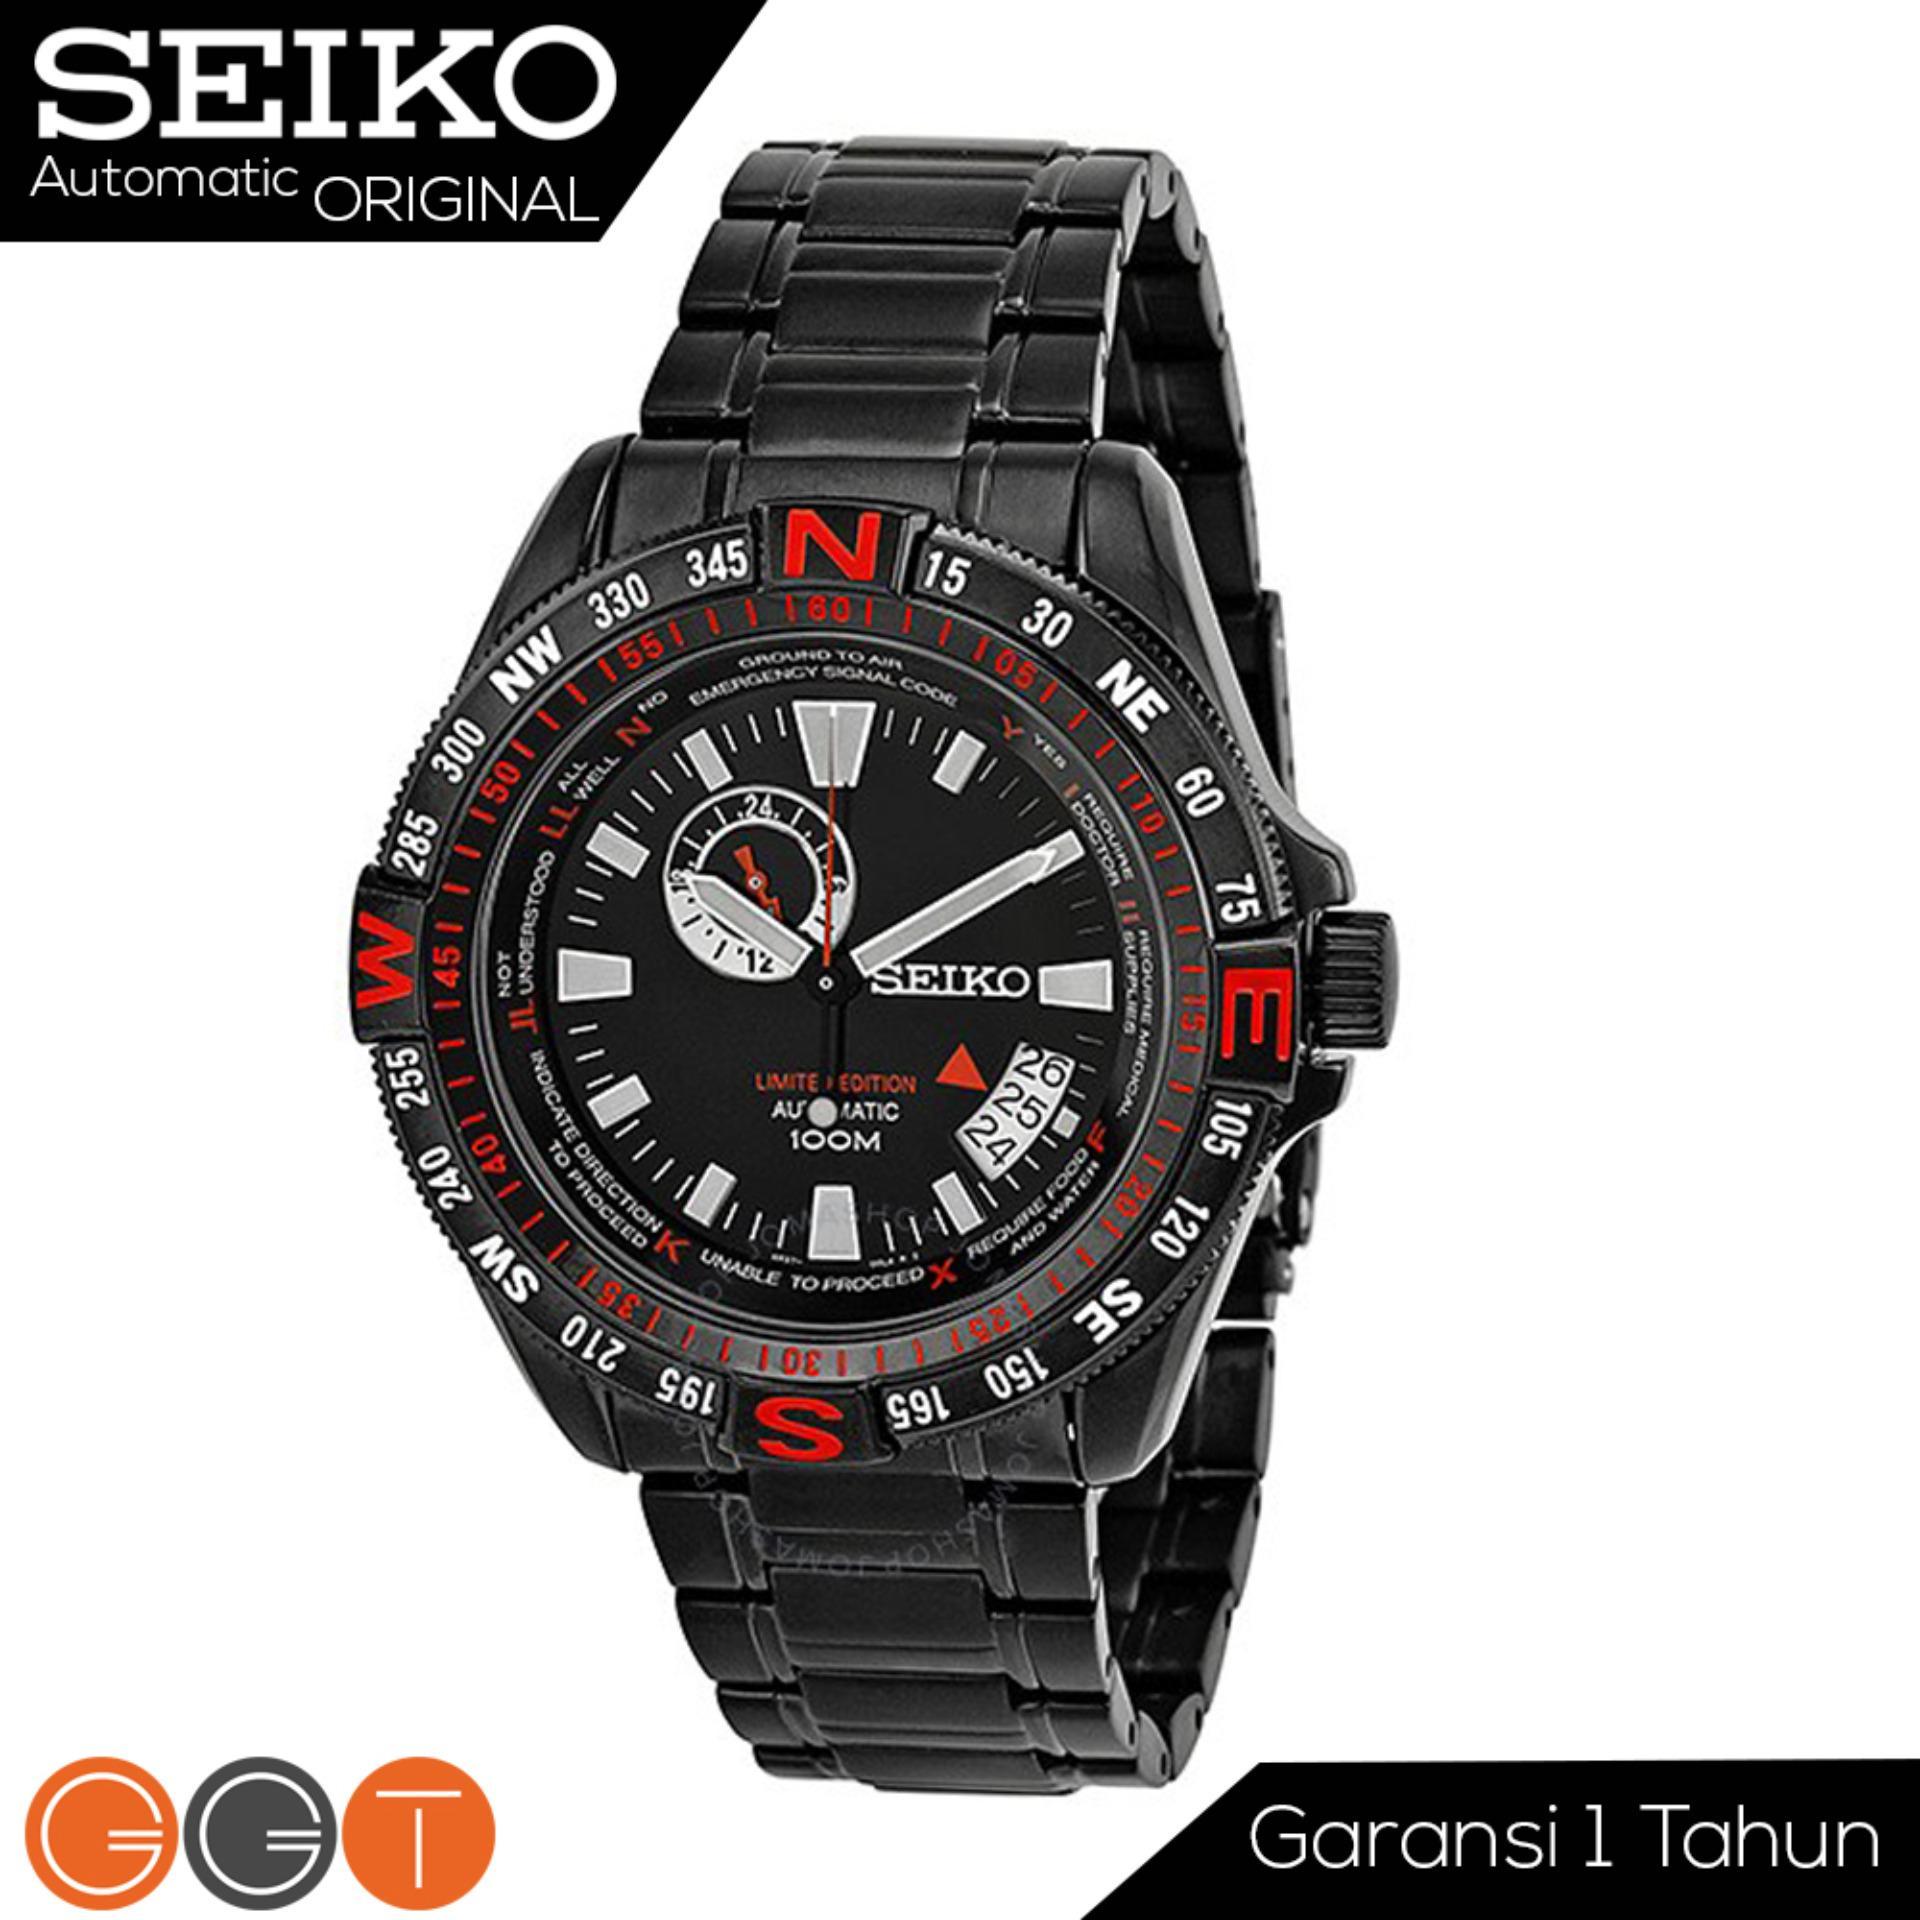 Seiko 5 Sports Automatic Limited Edition Jam Tangan Tali Karbon Sport Srpa07k1 Pria Otomatis Merah Hitam Divers Stainless Steel Strap Ssa113k1